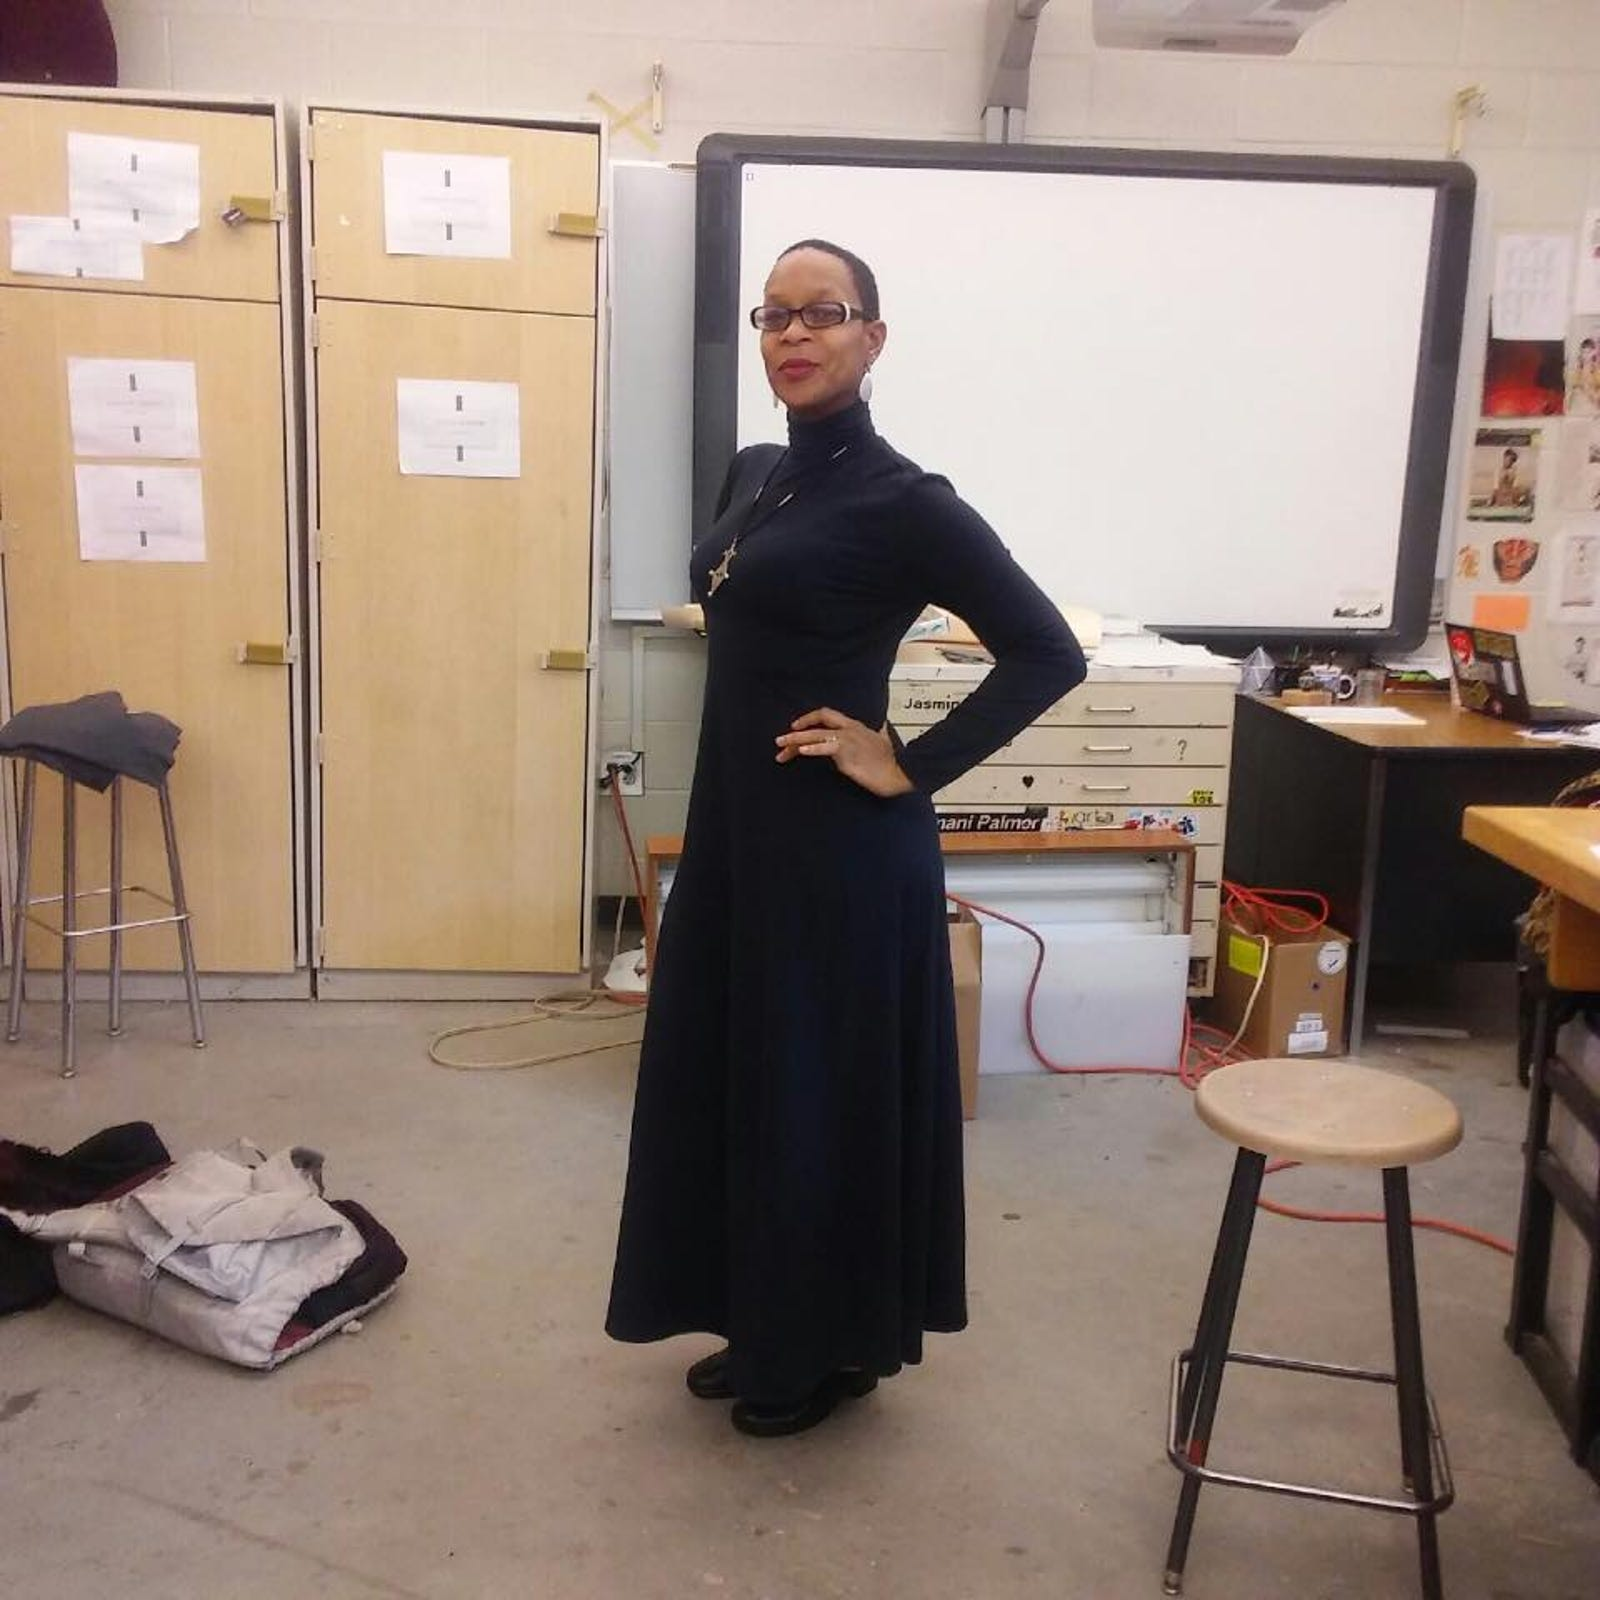 V. Kottavei Williams, head of Grady High School's Fashion Marketing Pathway Program.